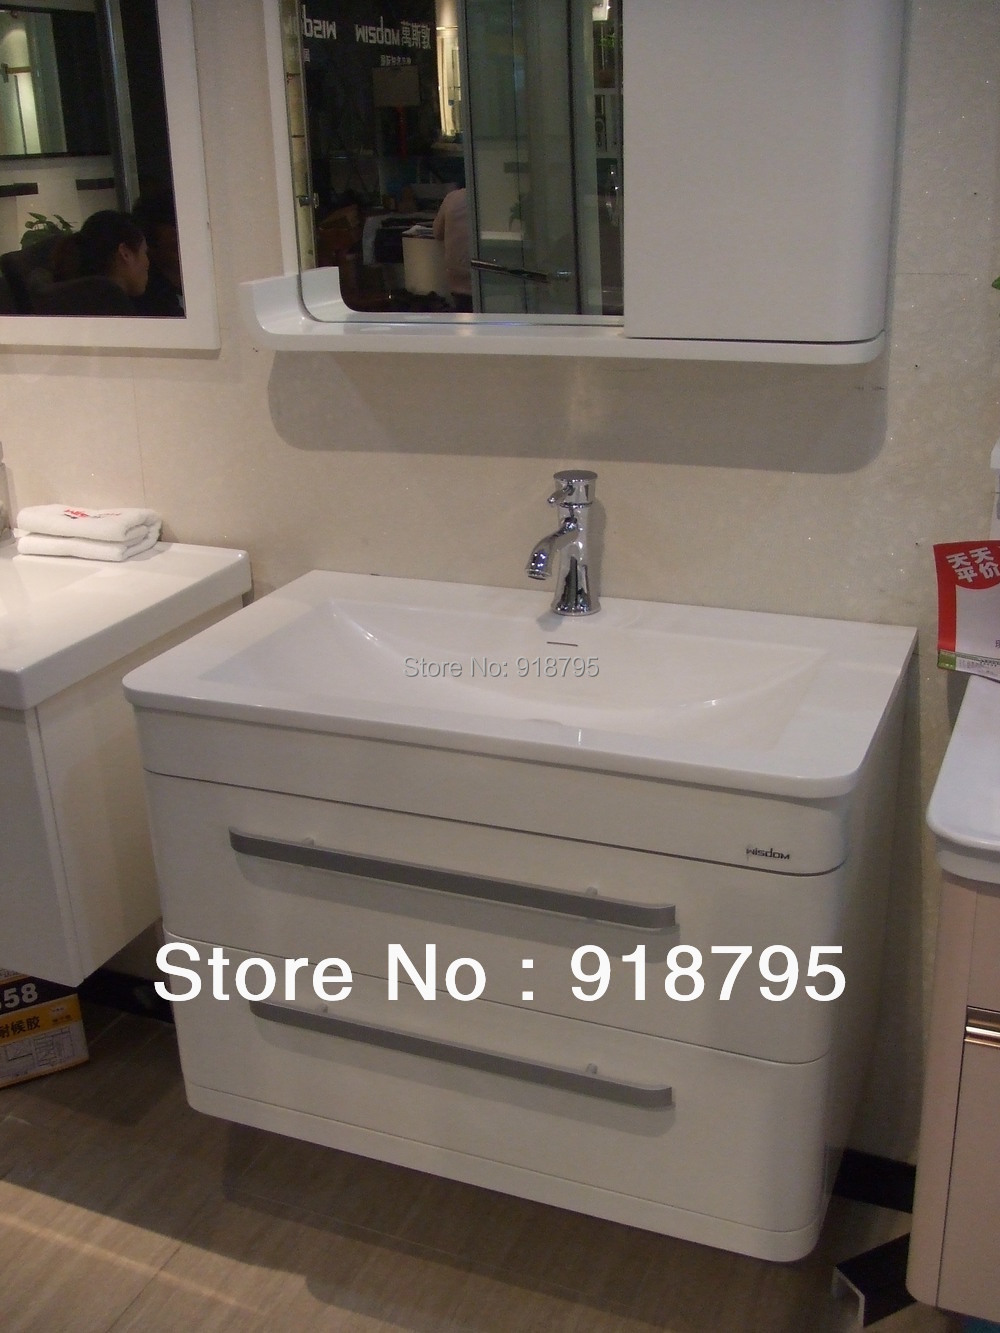 Vanite salle de bain pas cher for Meuble lavabo bois pas cher